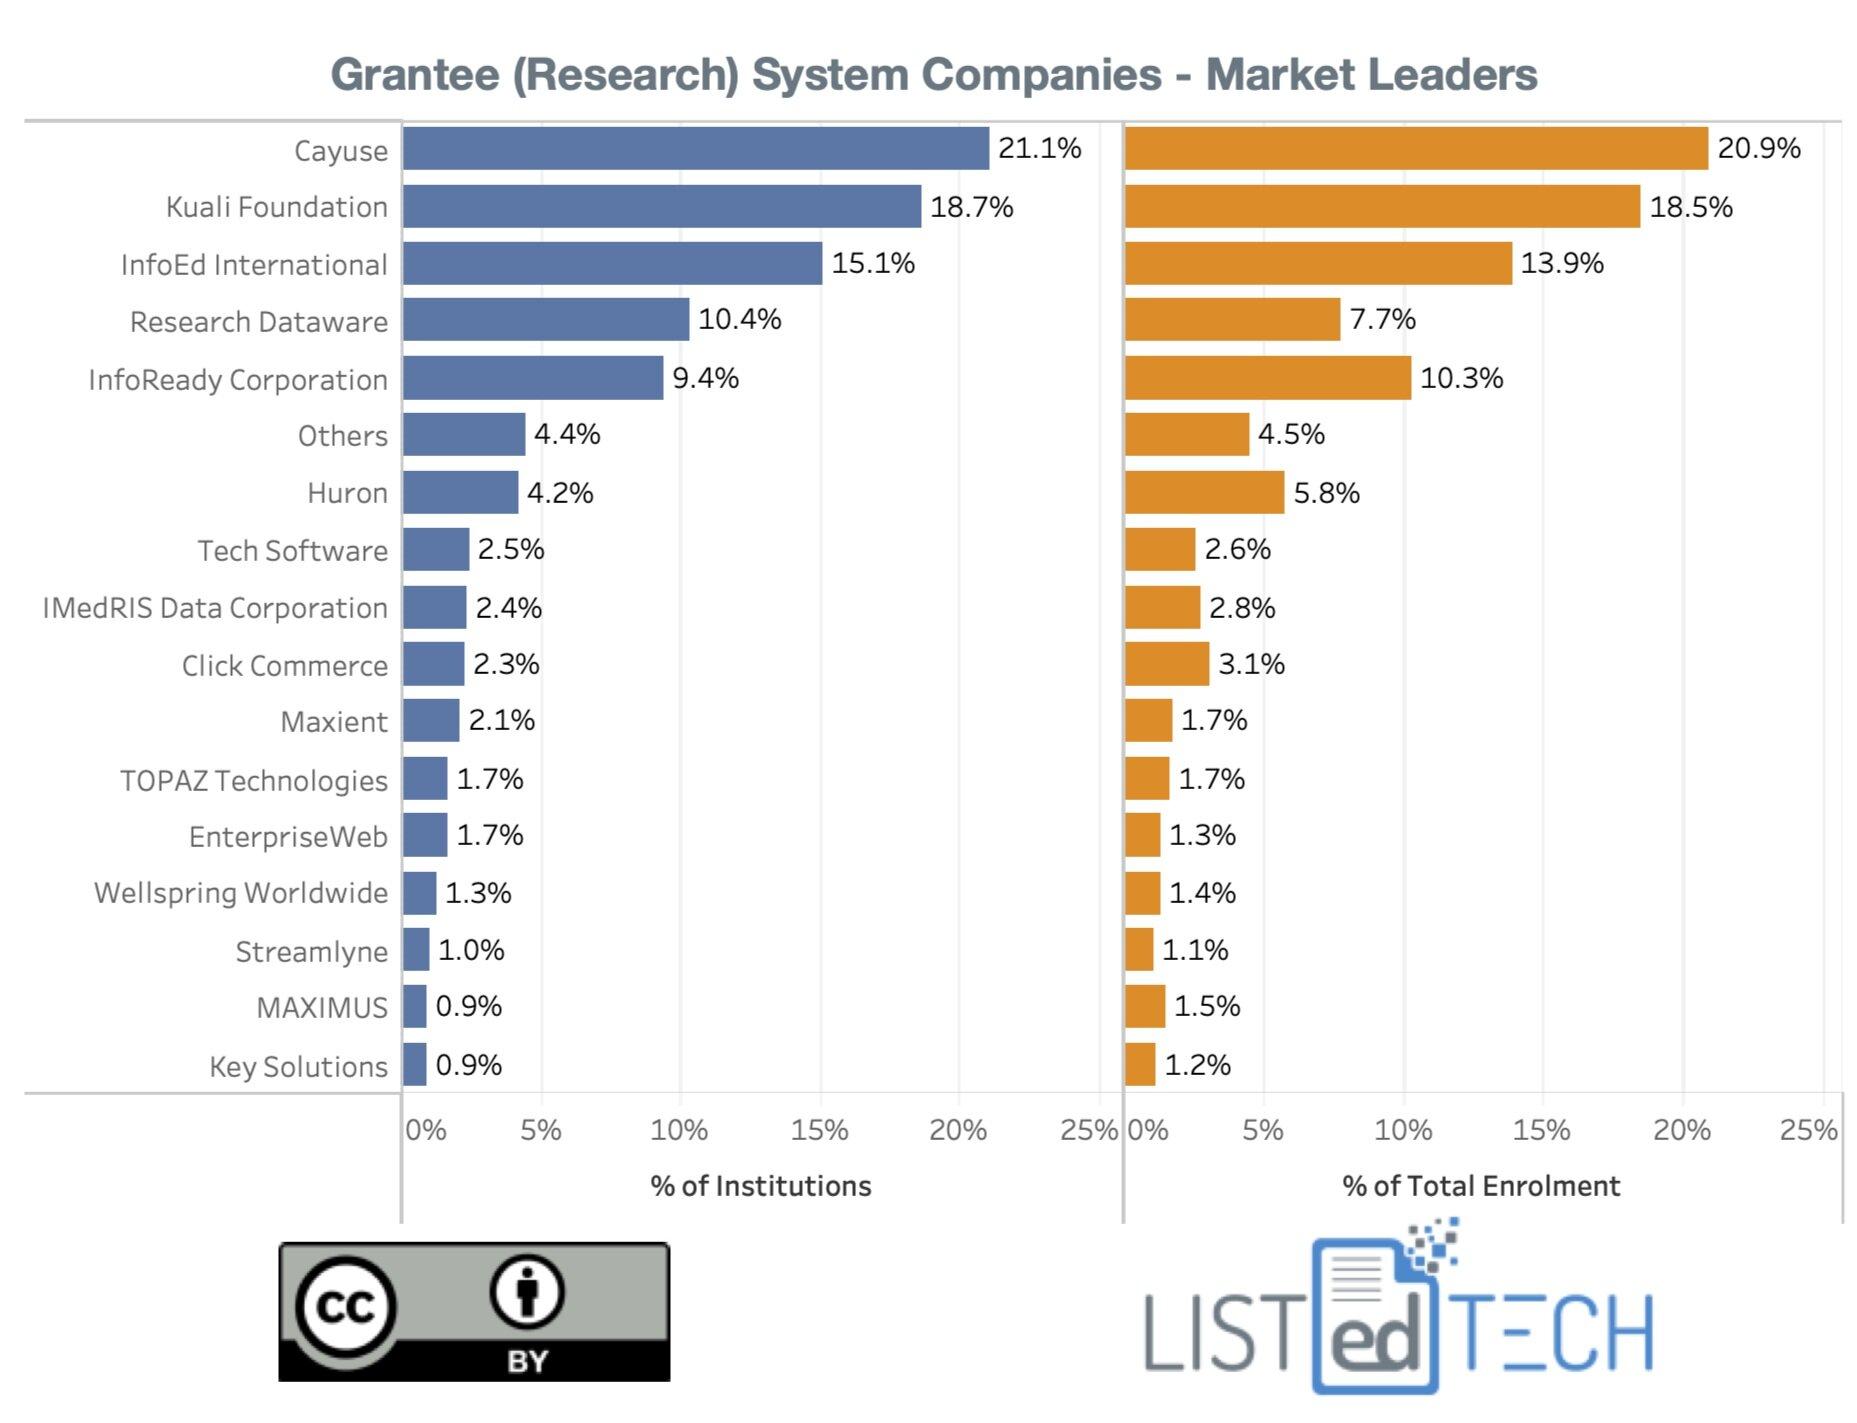 Grant Post Market - LisTedTECH